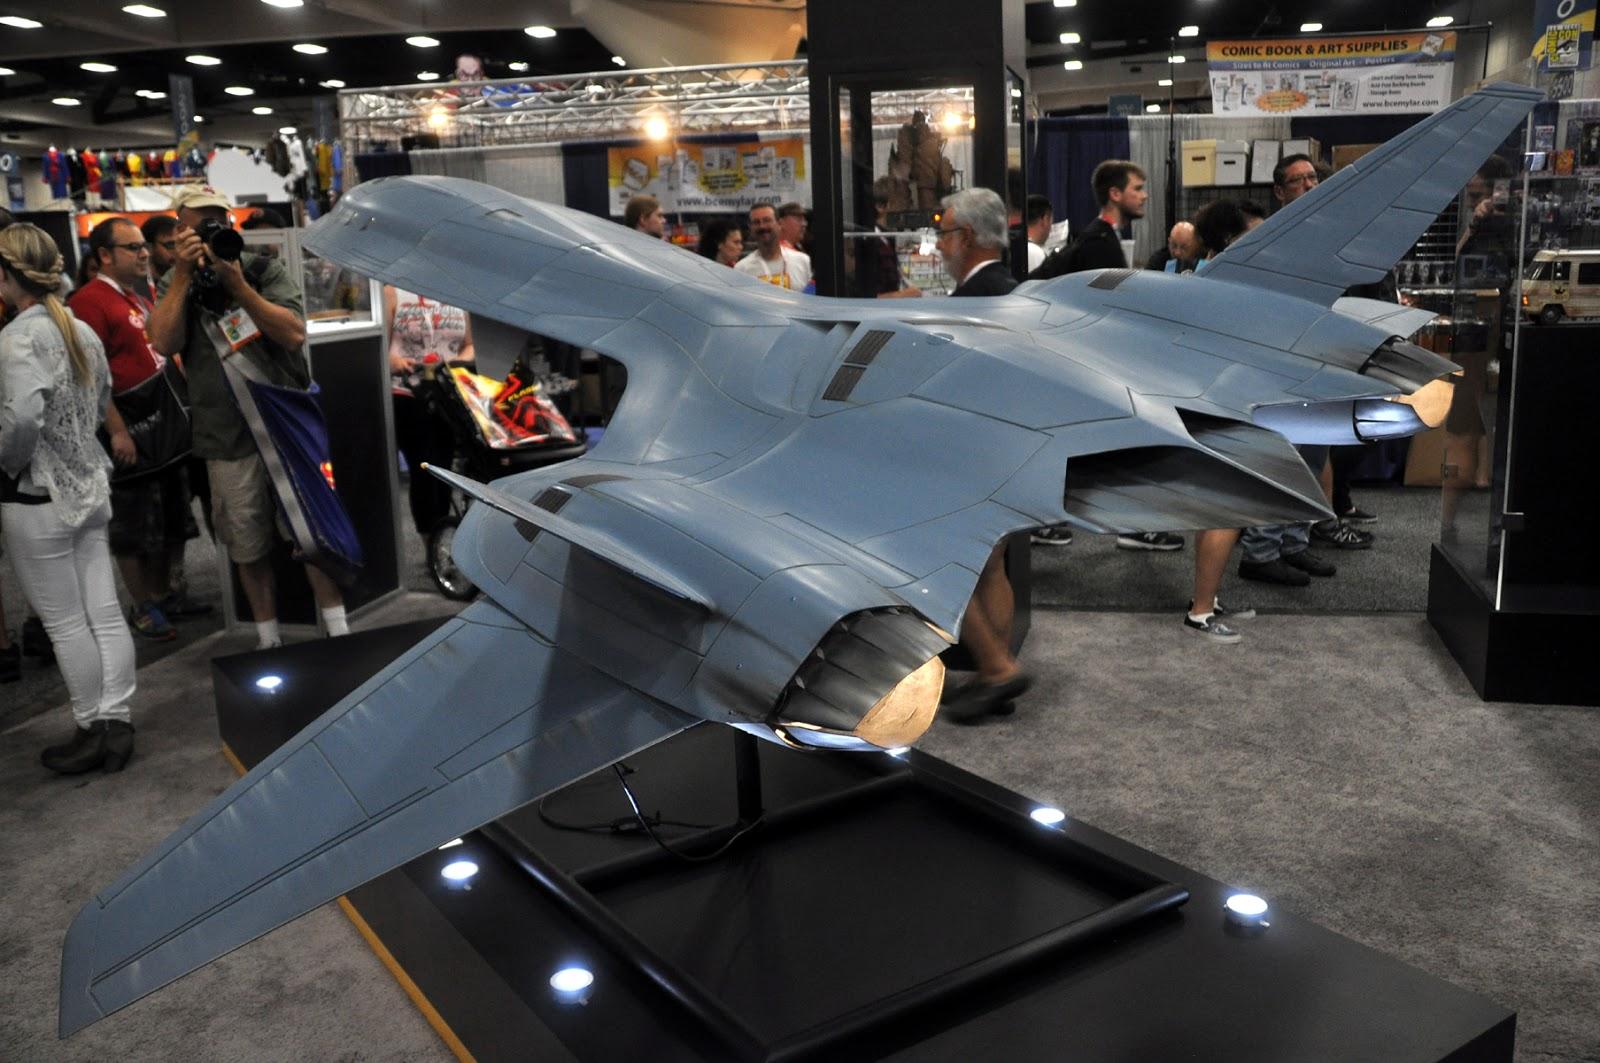 Toyota Tundra Diesel >> the X-Men X-Jet movie prop - AUTOCAR REGENERATION